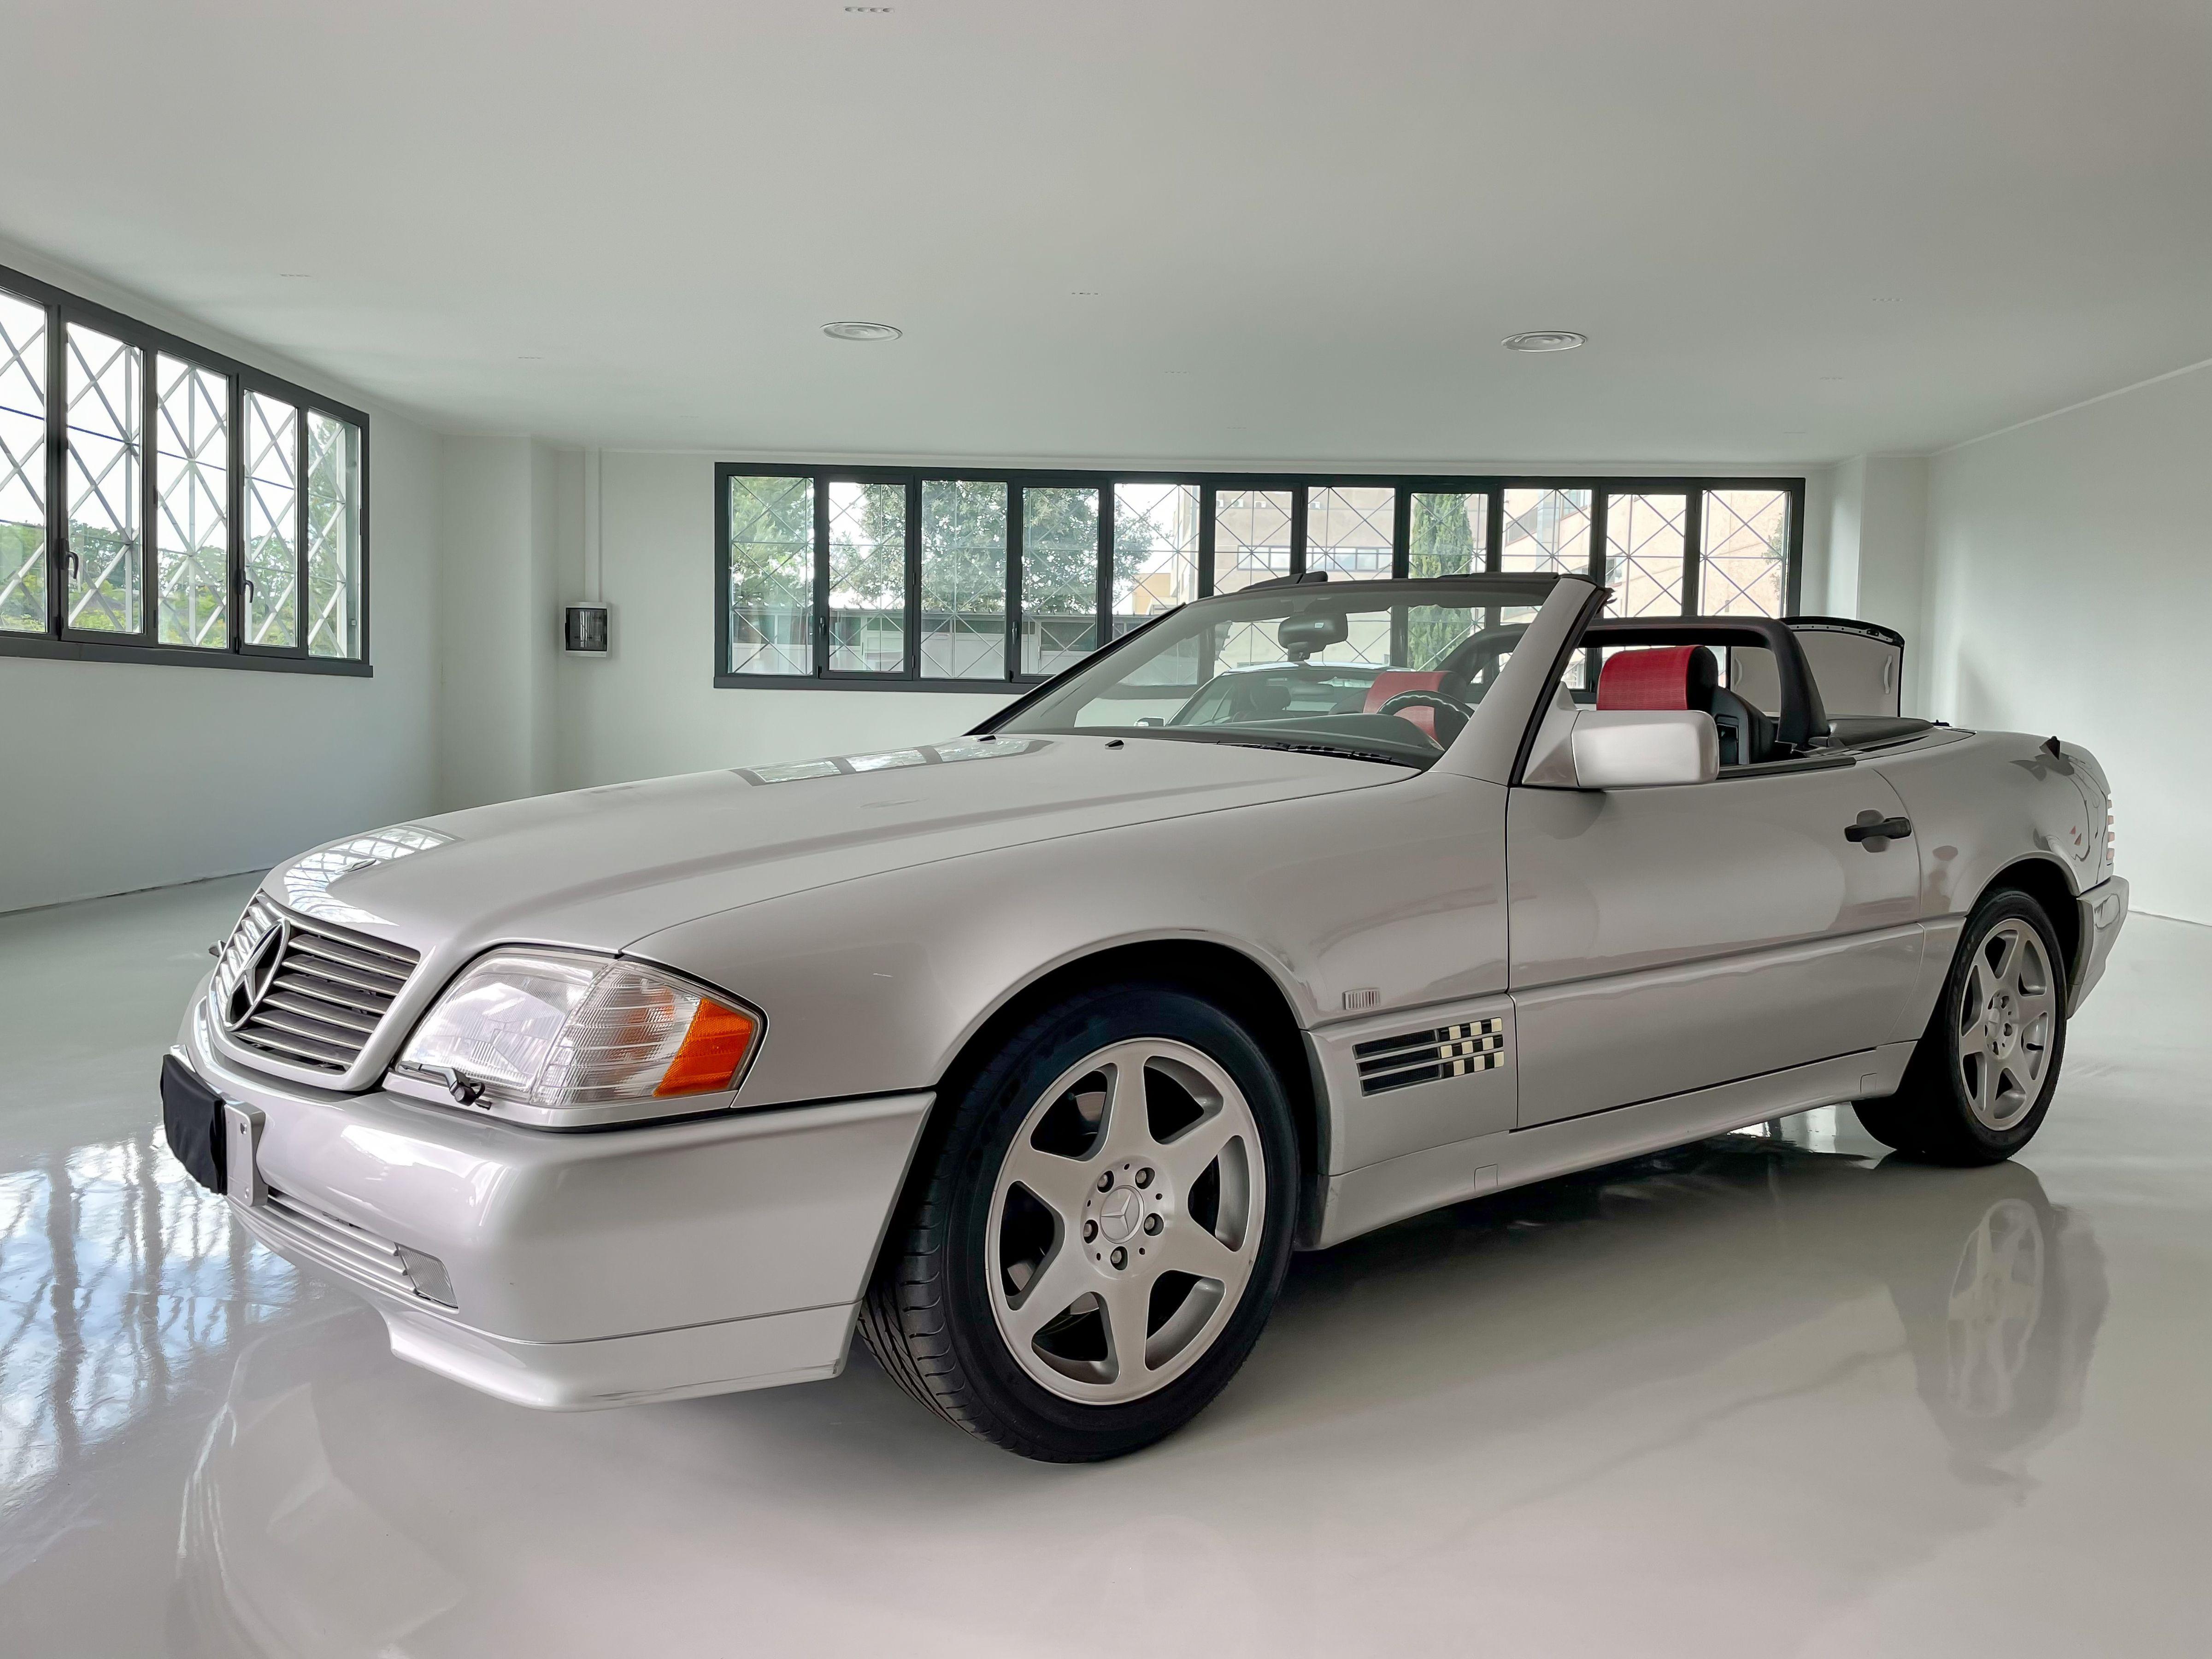 1995 Mercedes-Benz SL 320 Mille Miglia Edition